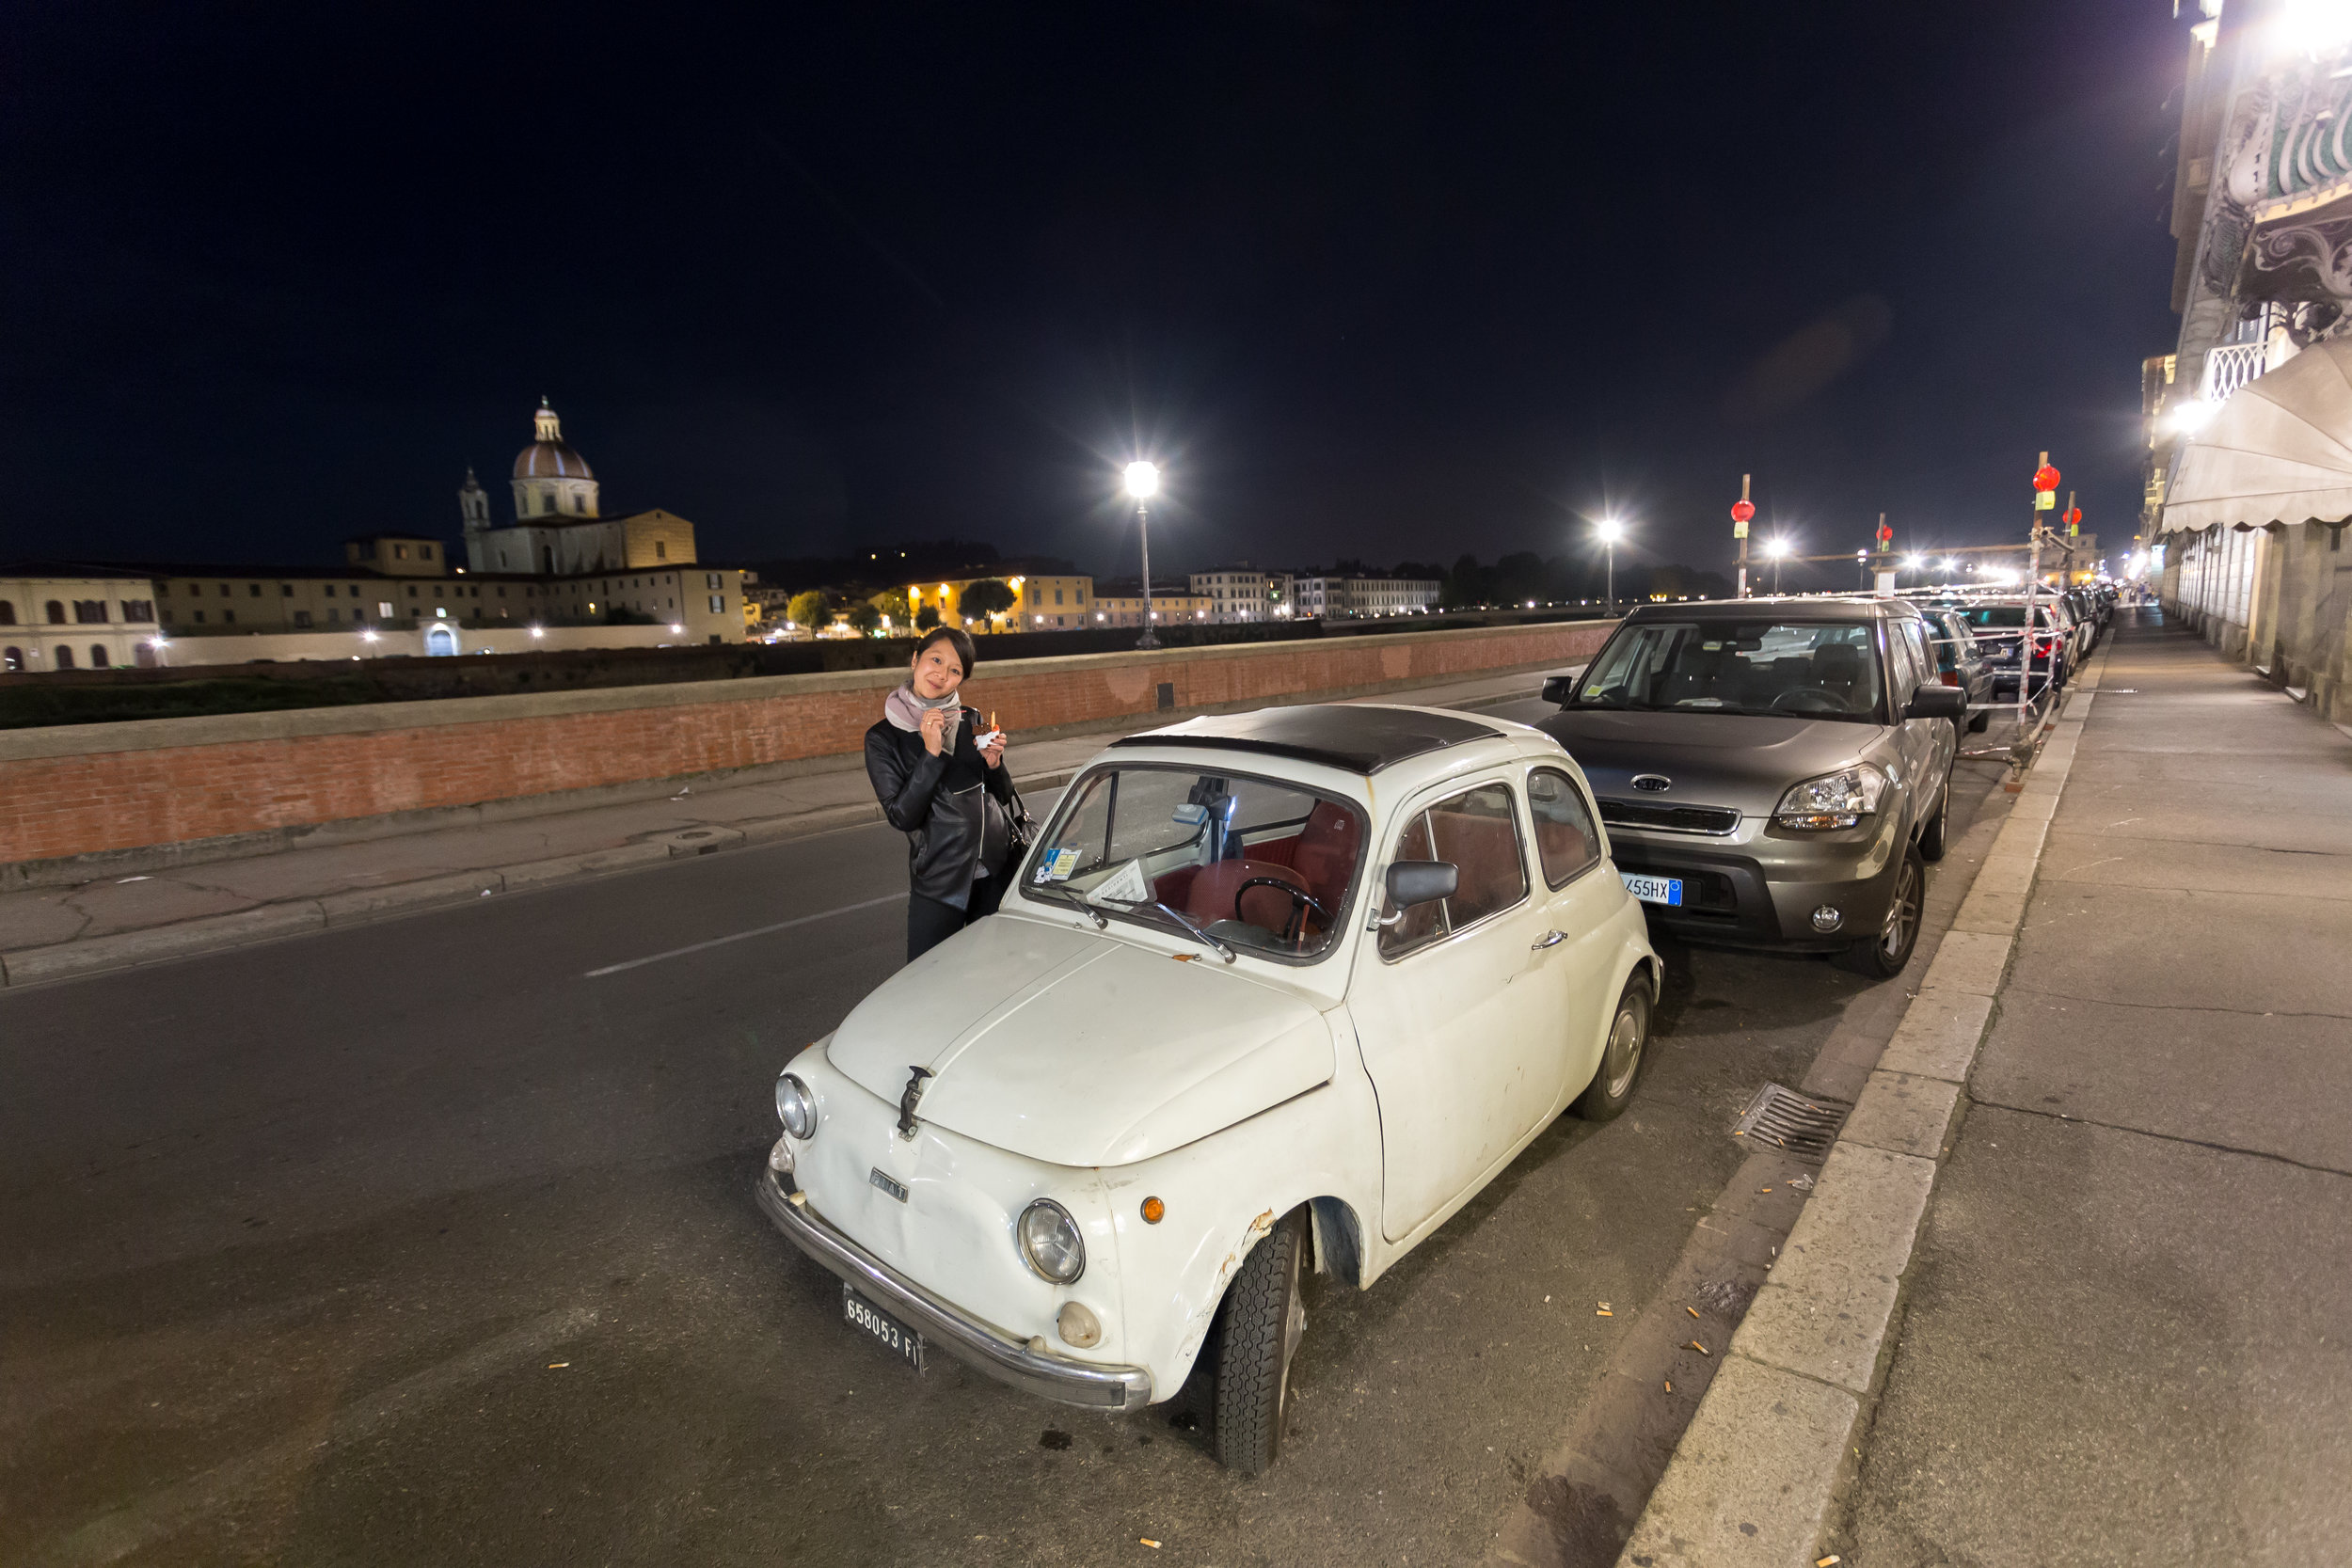 Gelato and mini cars. So Italian.